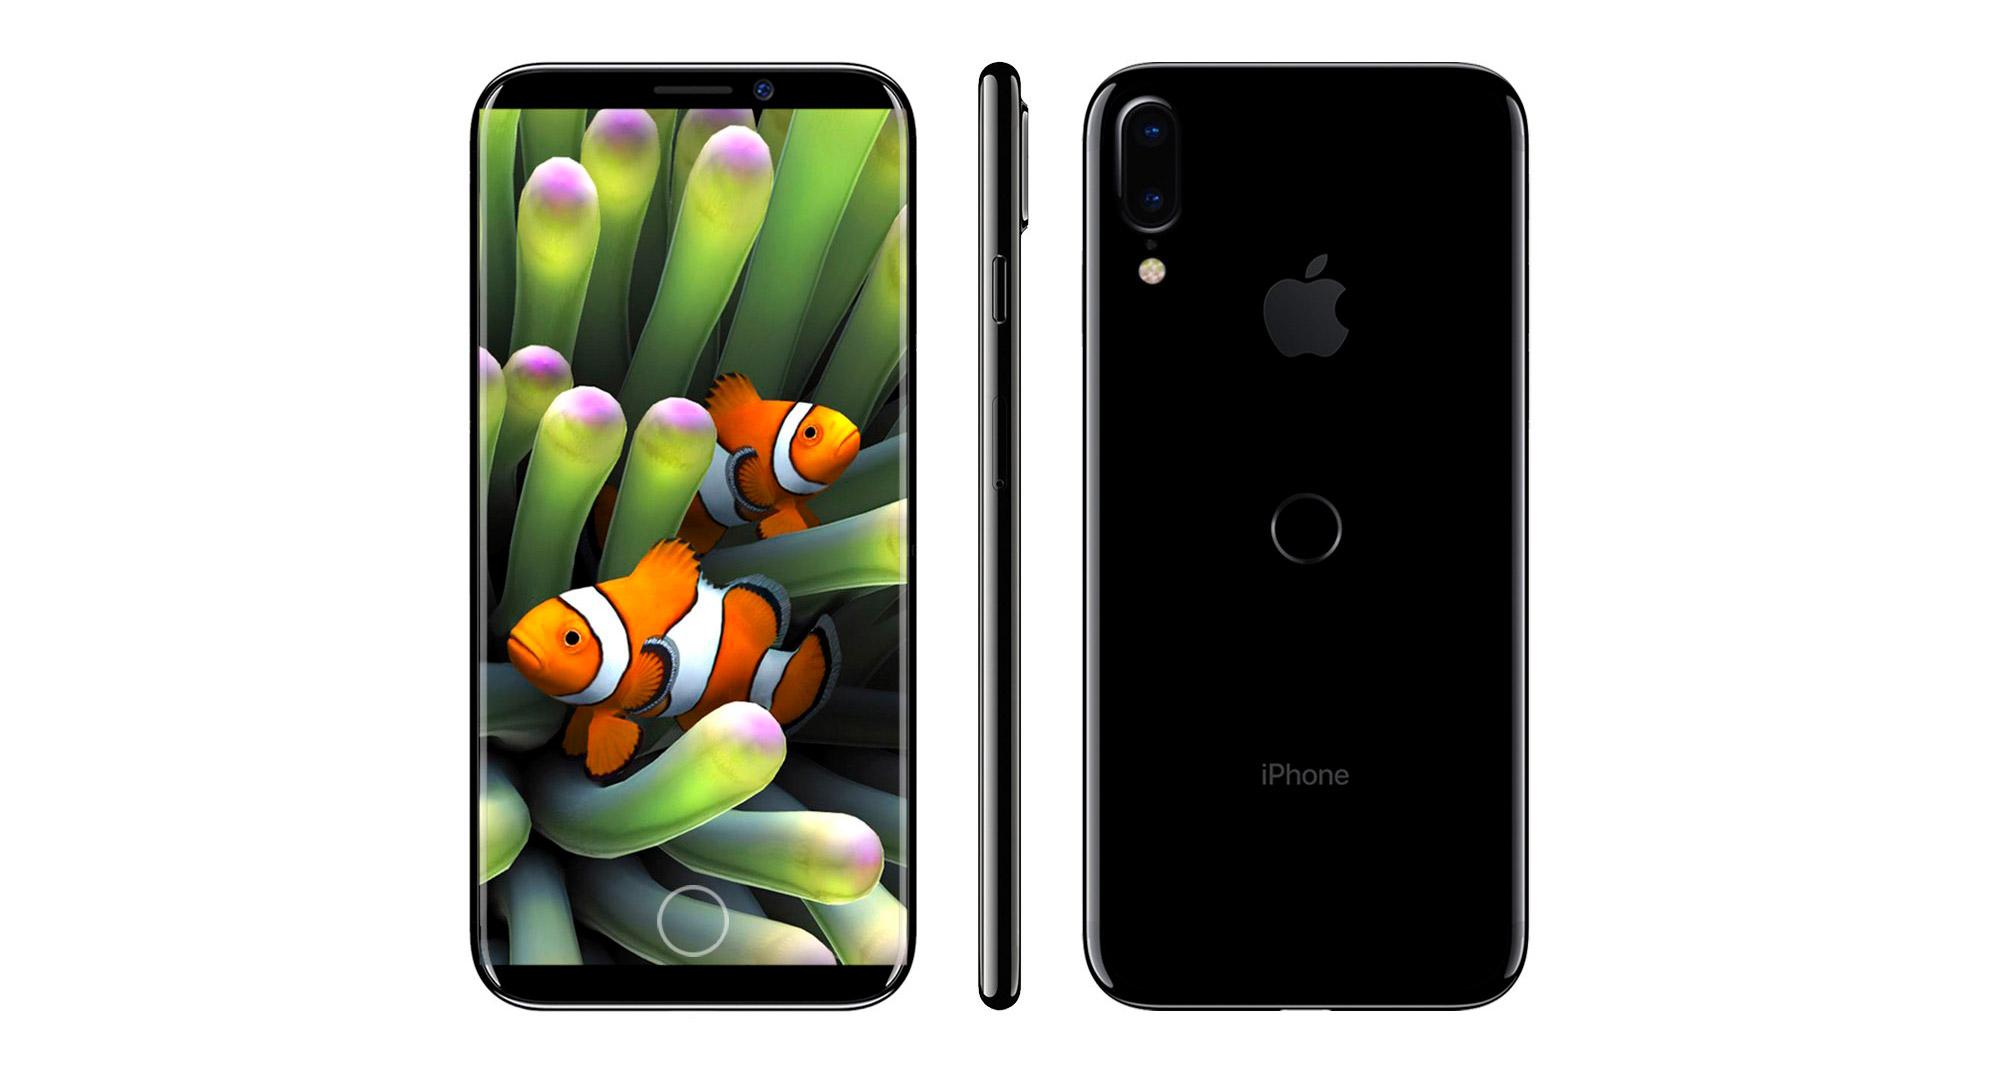 iphone 8 fingerprint sensor